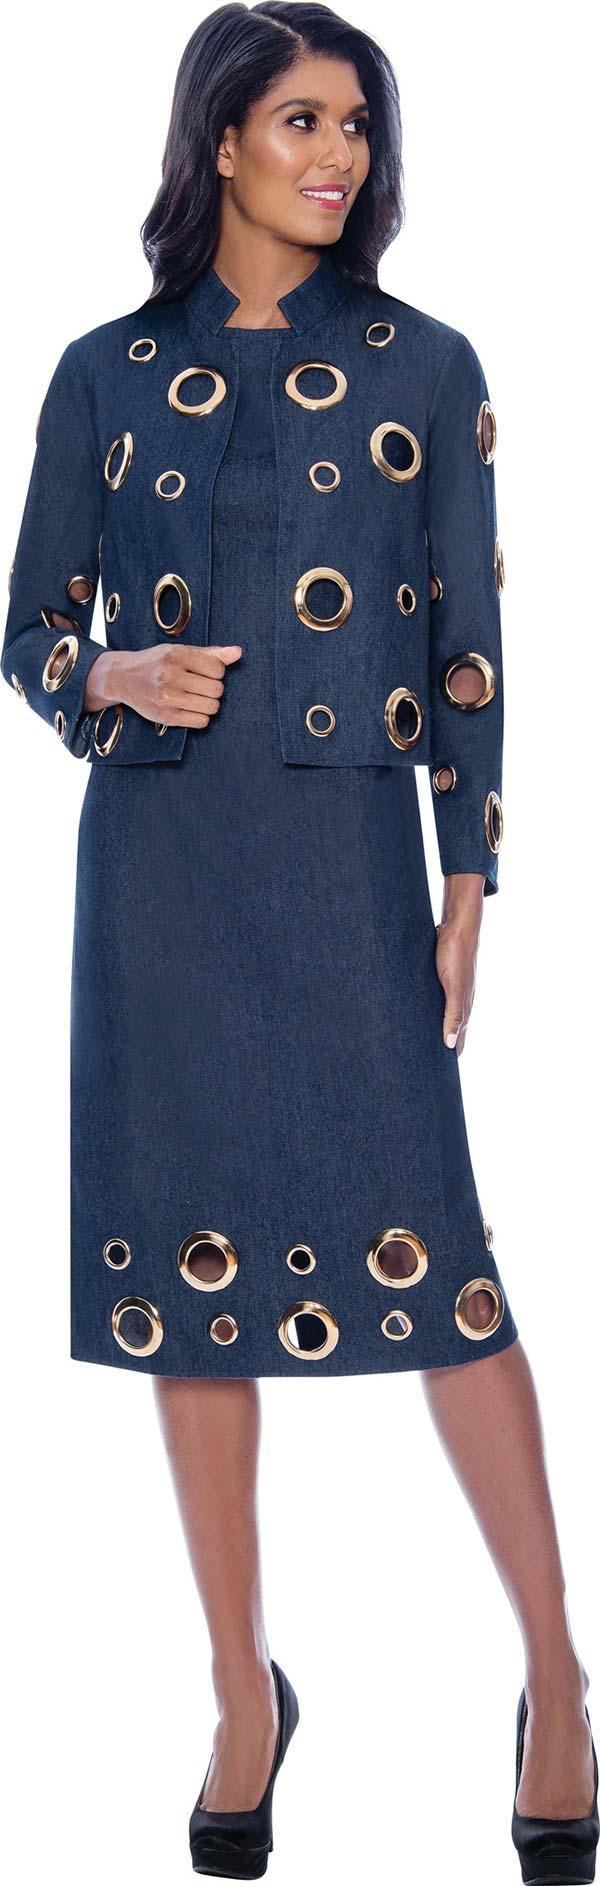 Devine Sport DS62742 - Soft Stretch Denim Dress Suit With Oversized Grommet Details